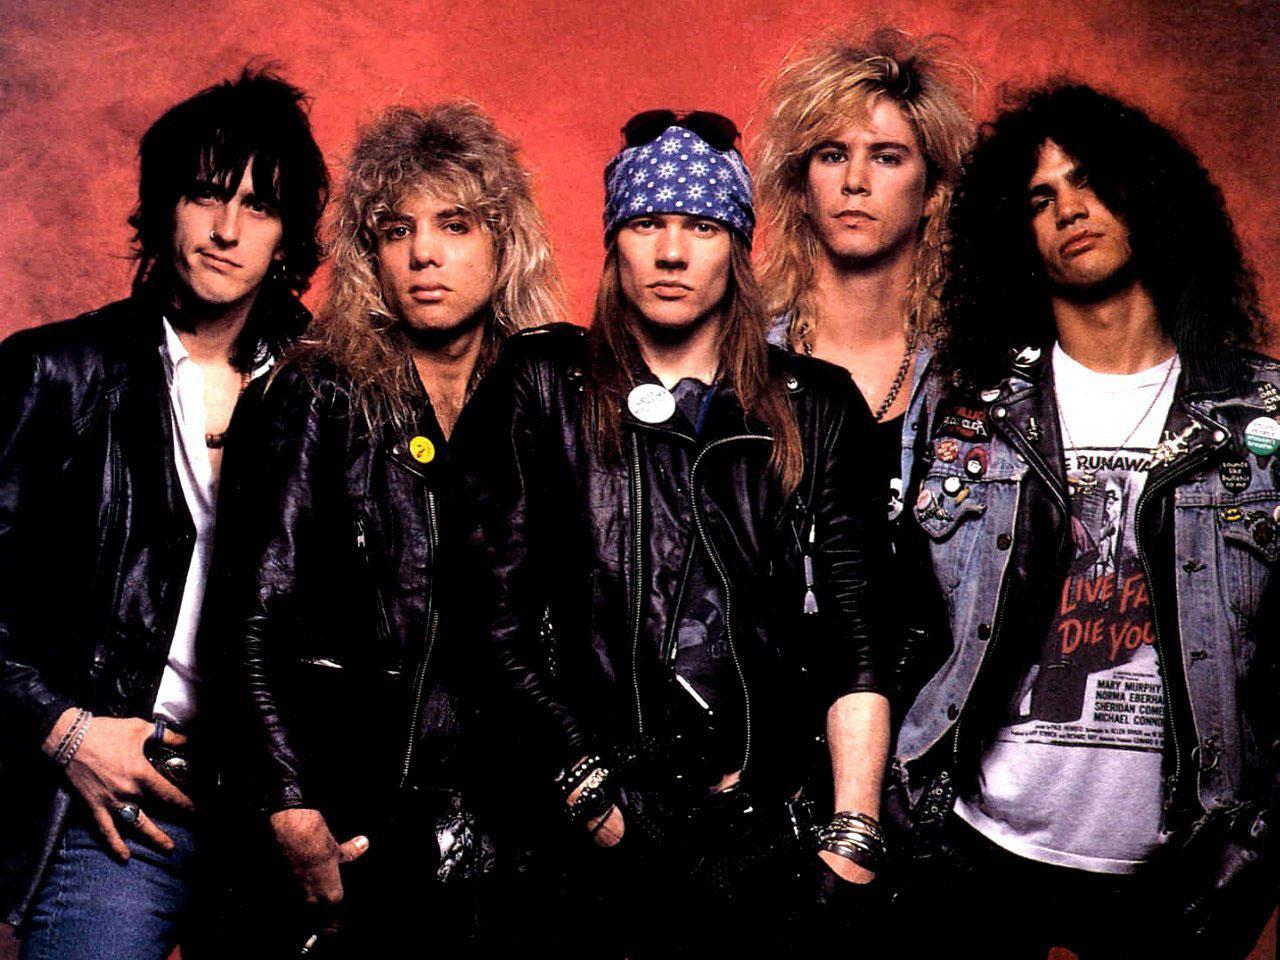 Guns N' Roses ARE reuniting… to headline Coachella 2016